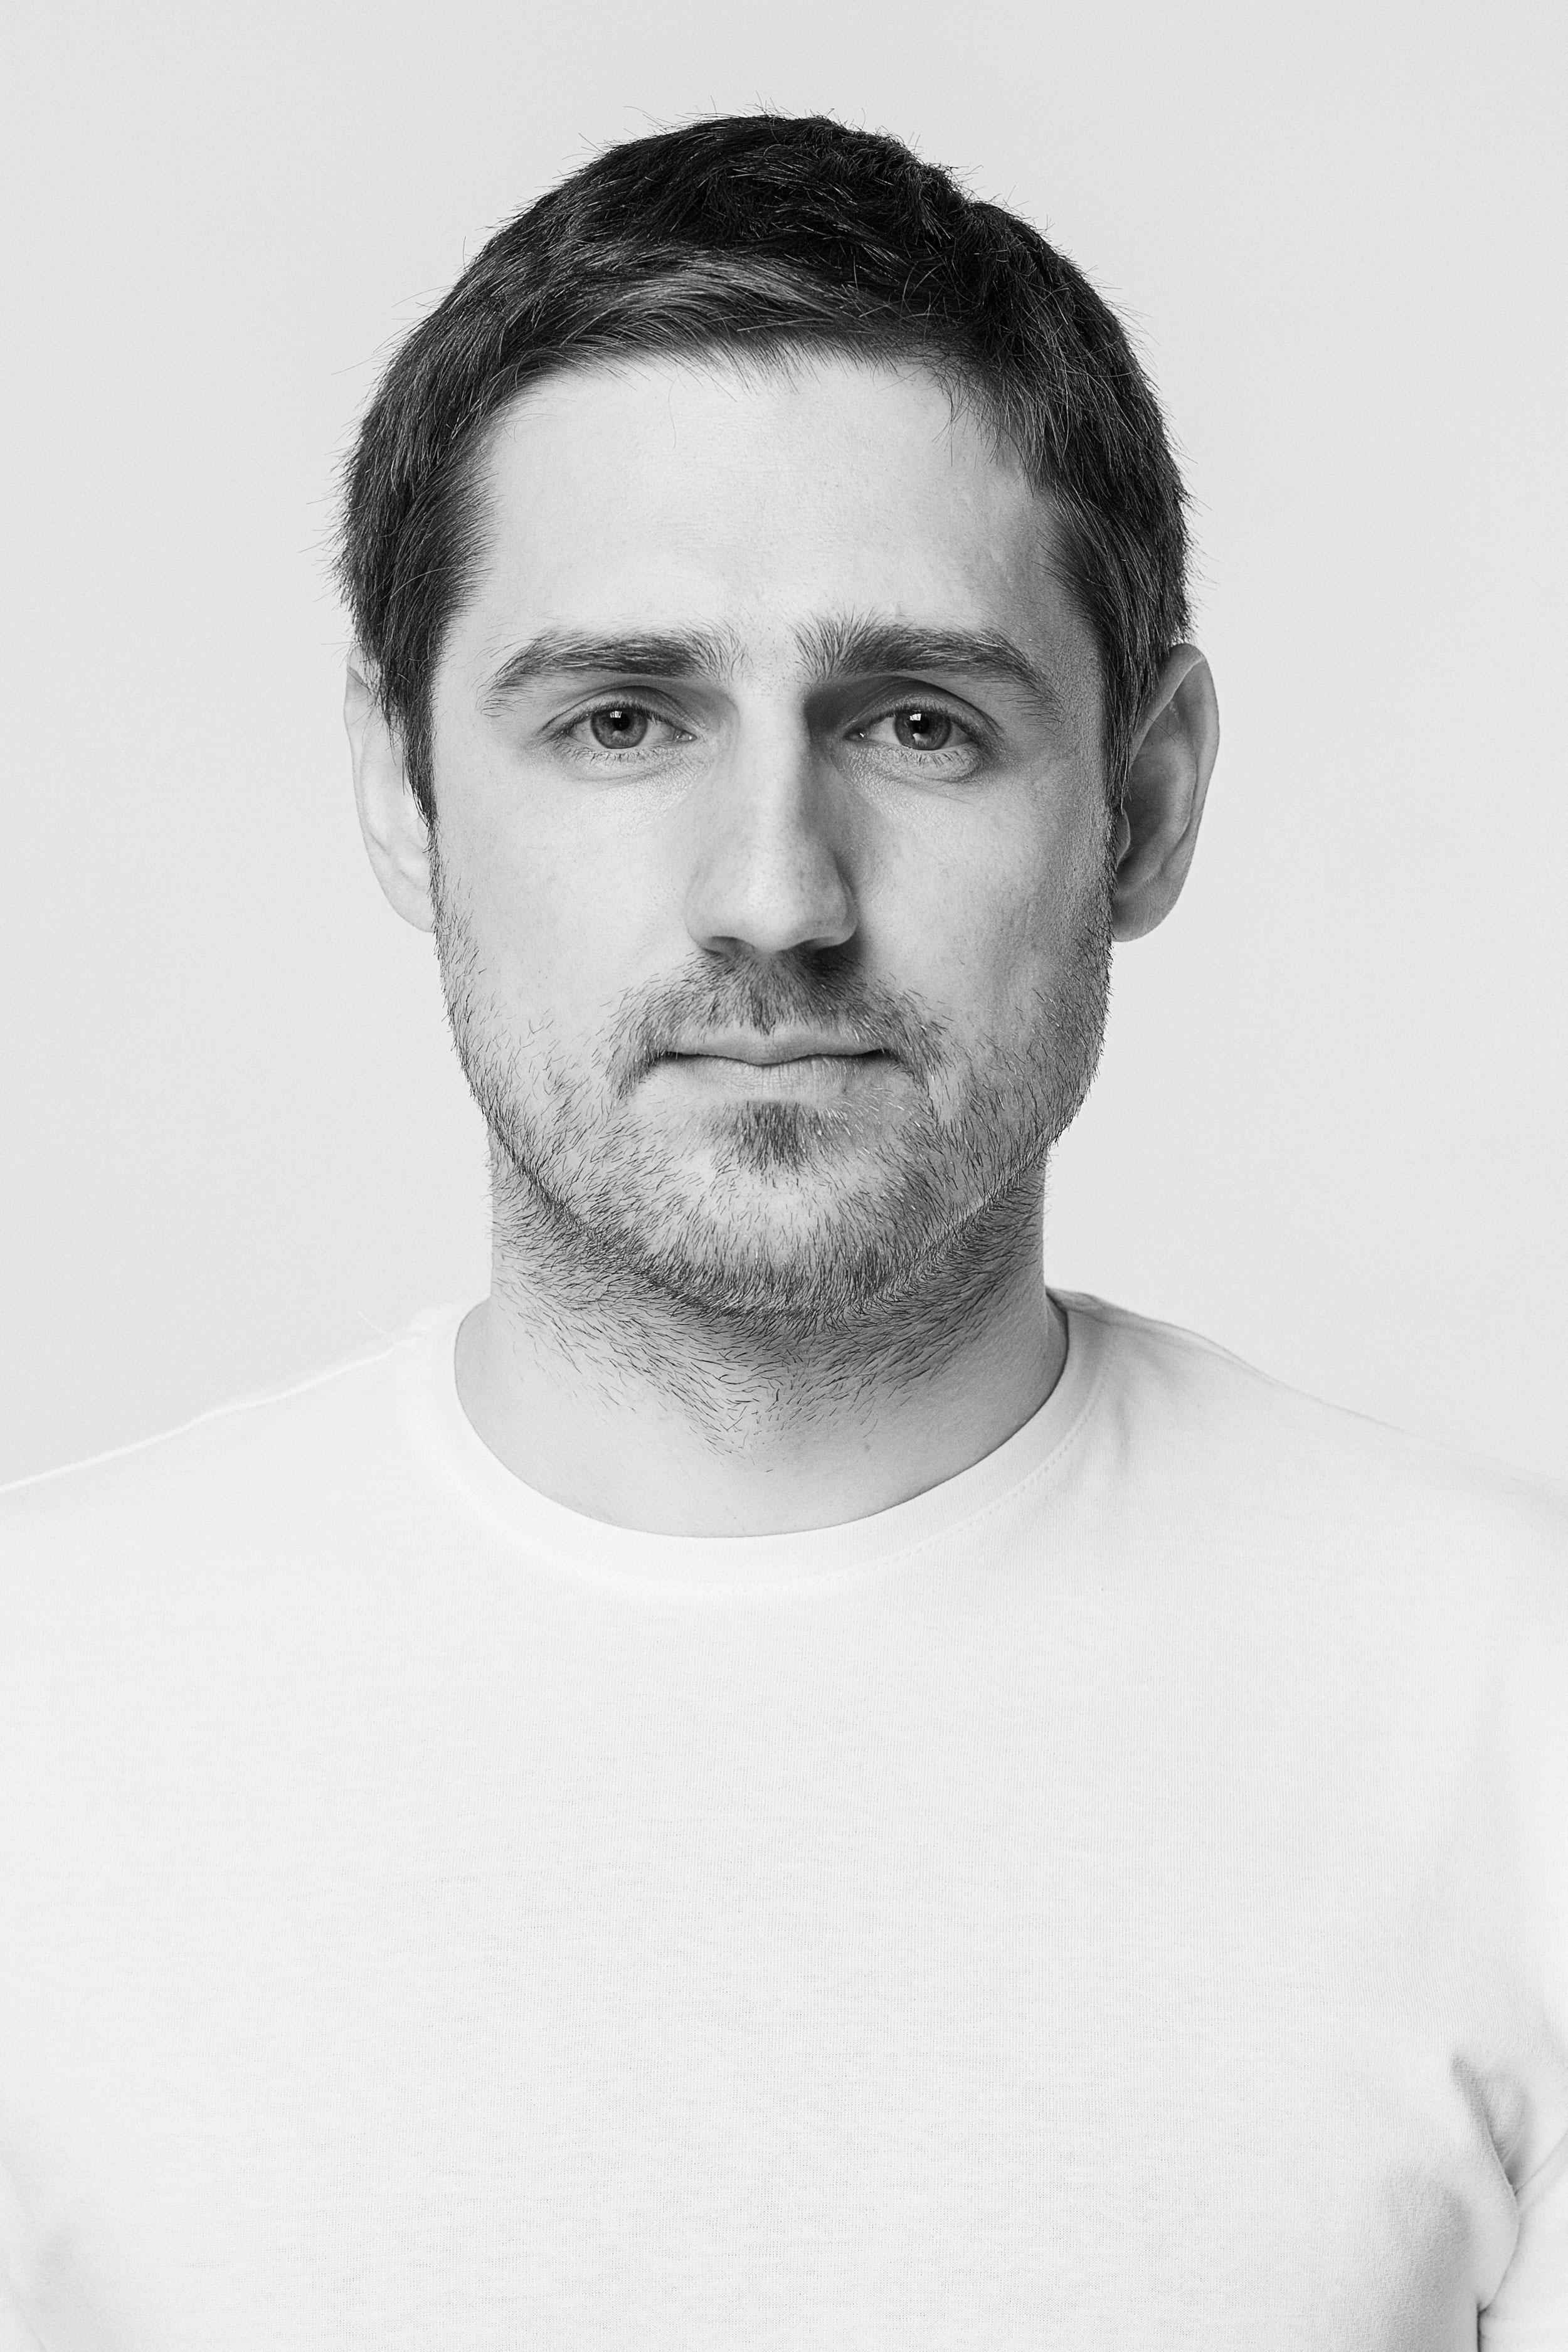 Tadas Maksimovas. Born on 30 March, 1984.